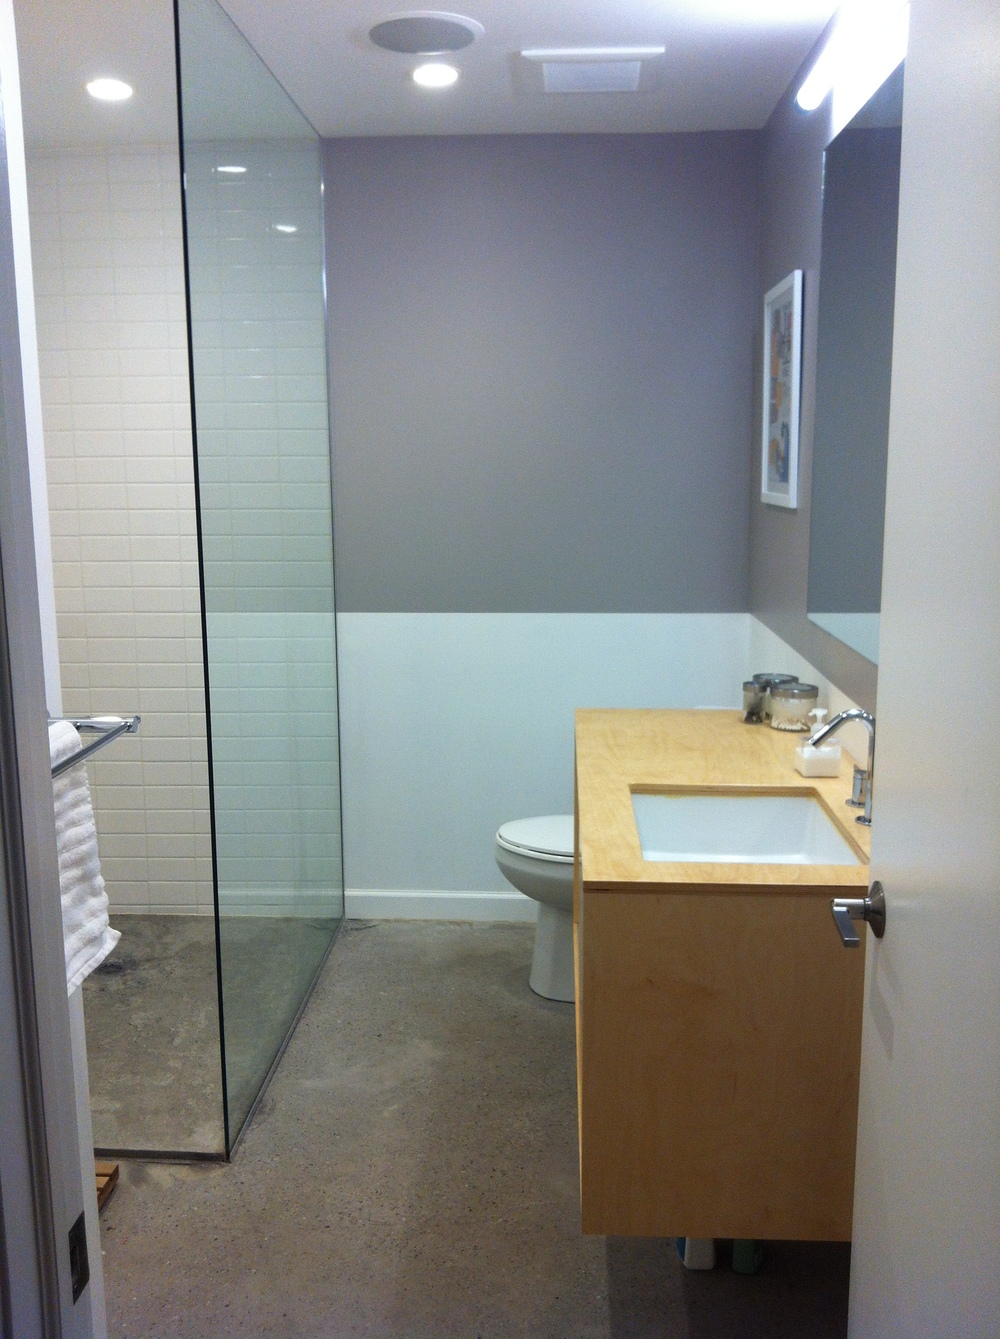 Bathroom ceiling speakers - Now Full Bathroom Custom Vanity Electric Floor Mat New Concrete Floor